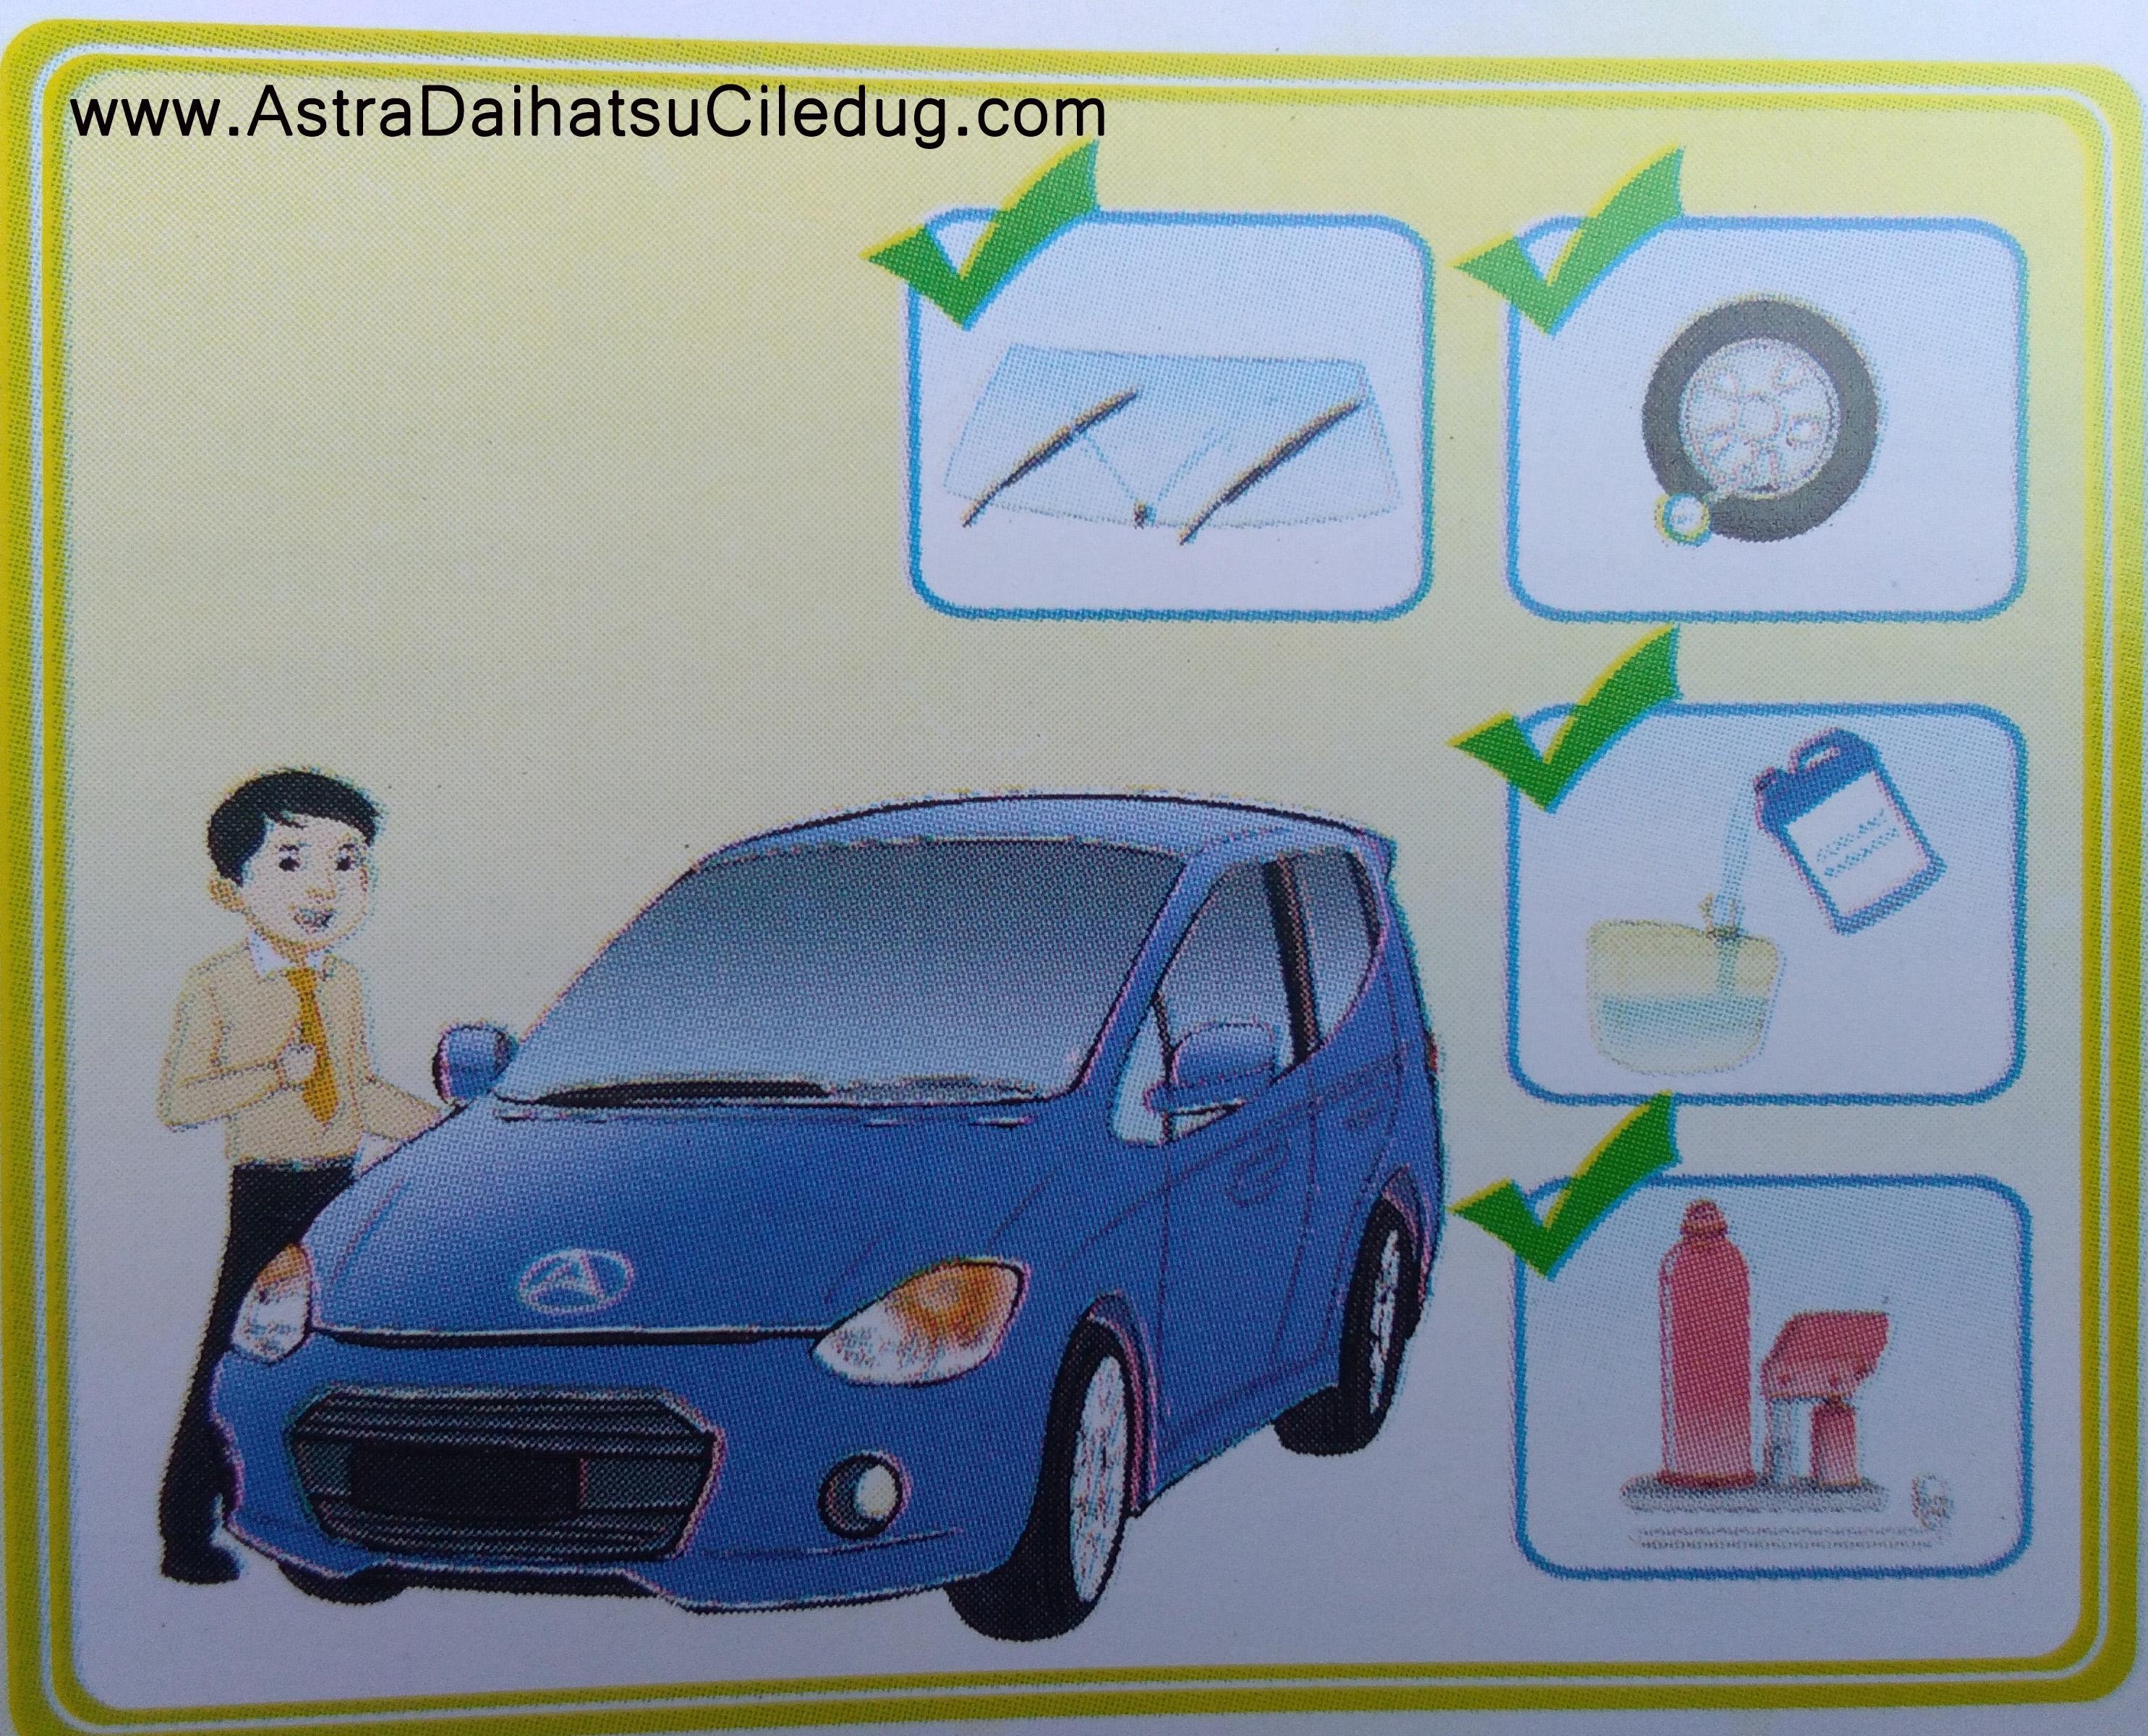 Daihatsu Ciledug 1 TIPS SAFETY DRIVING